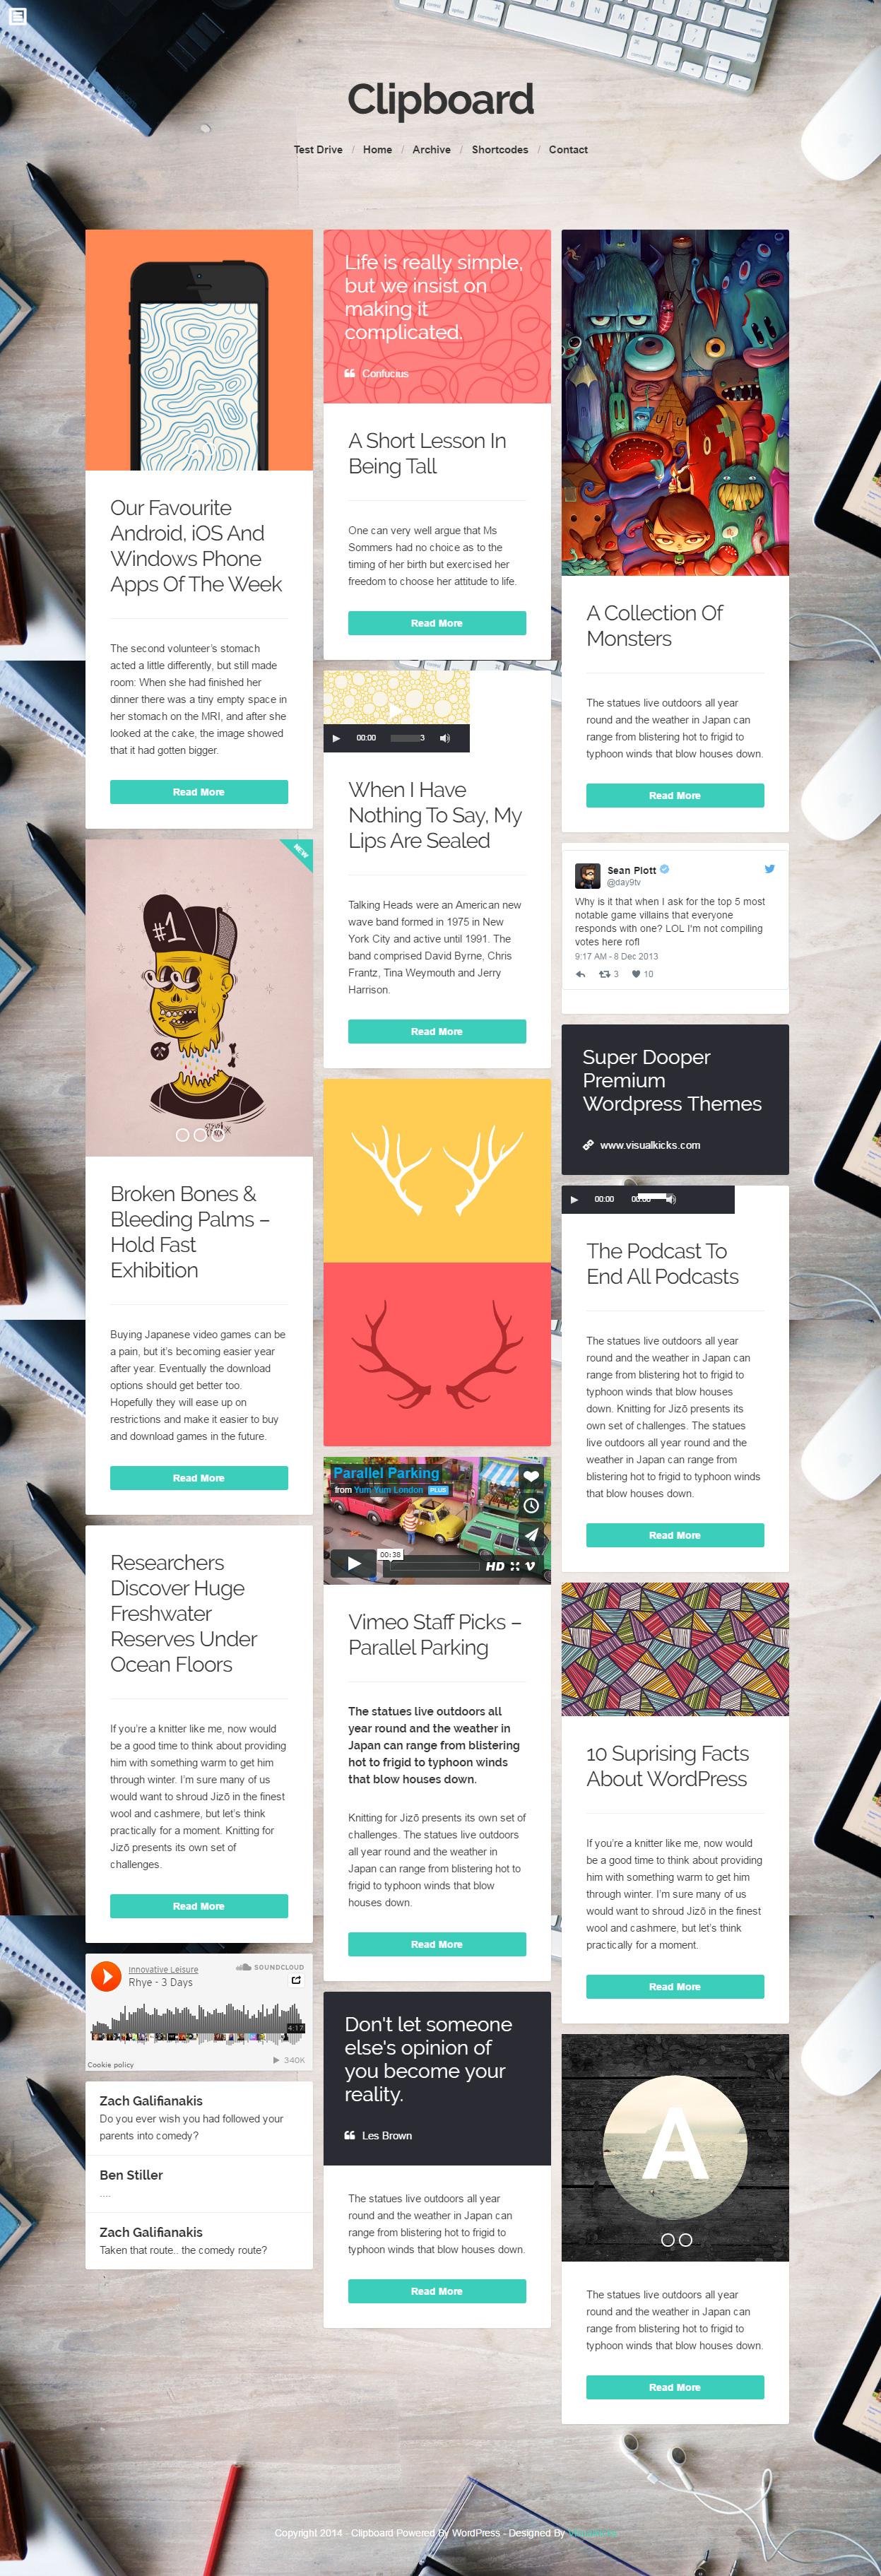 Best WordPress Theme Like Pinterest 2016 Responsive Miracle